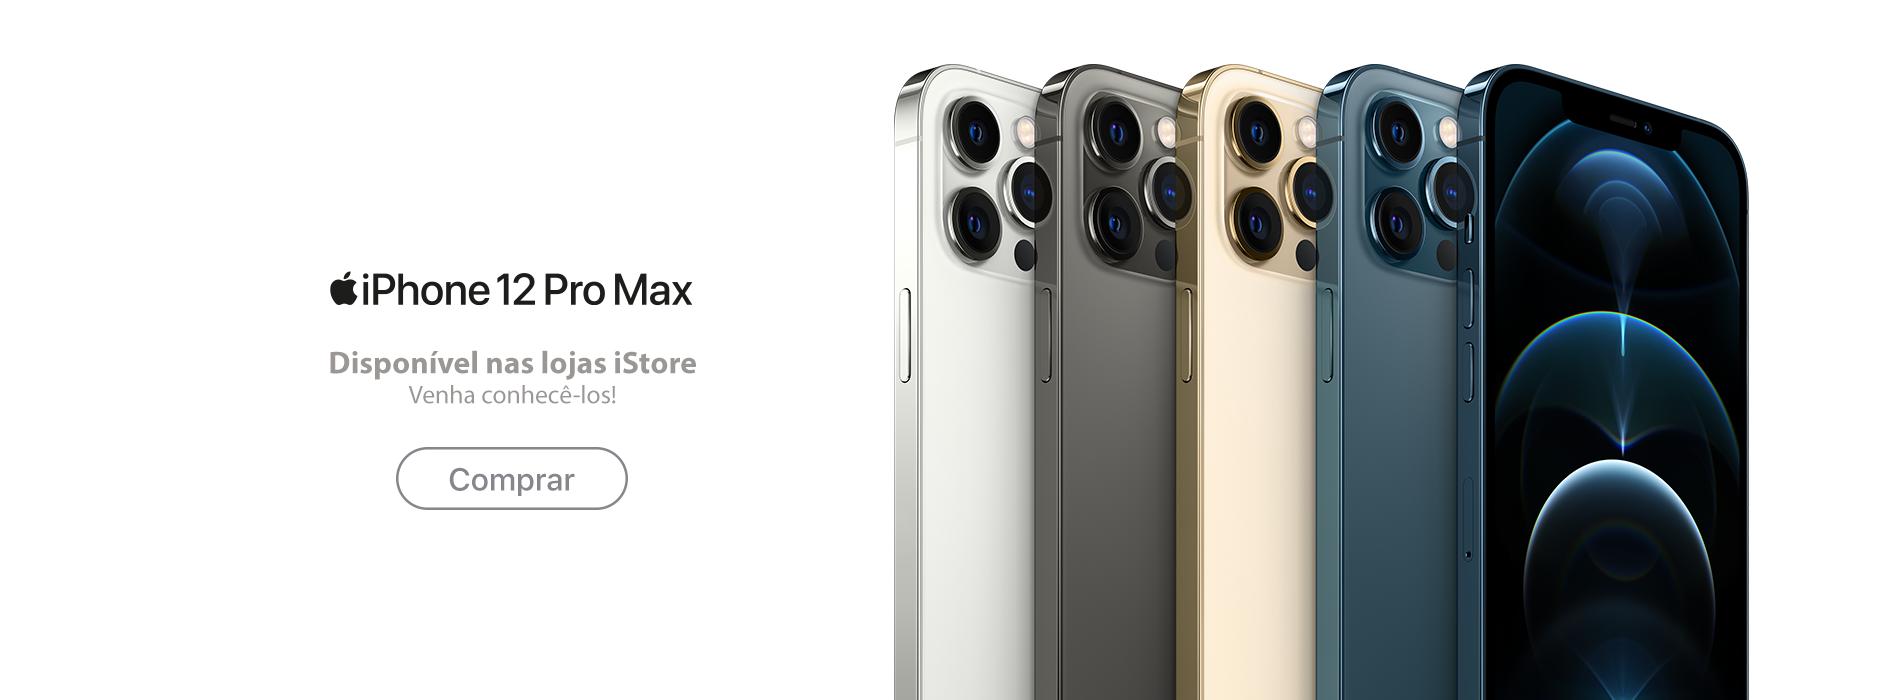 Homepage Slideshow - iPhone 12 Pro Max - Comprar